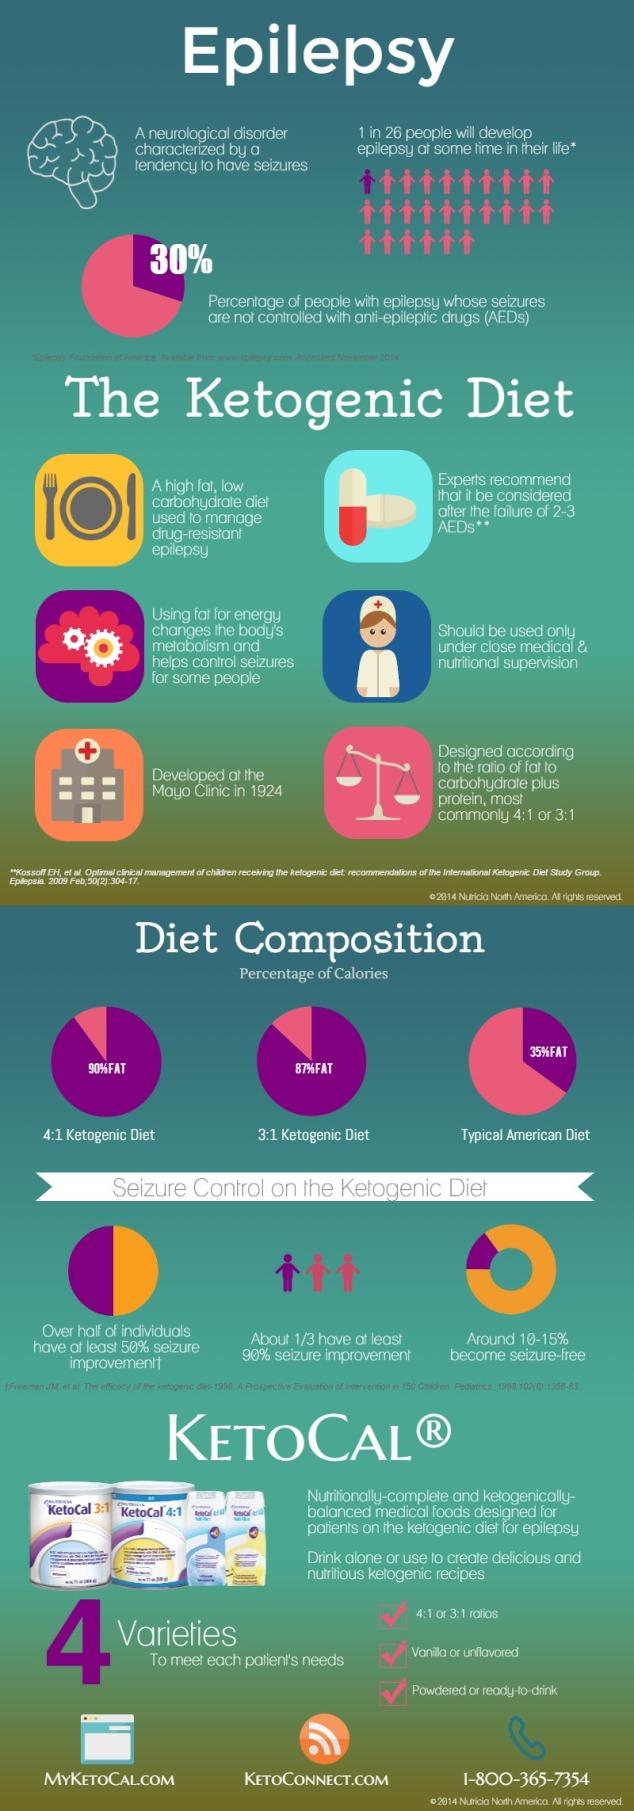 Ketogenic Diet jpeg